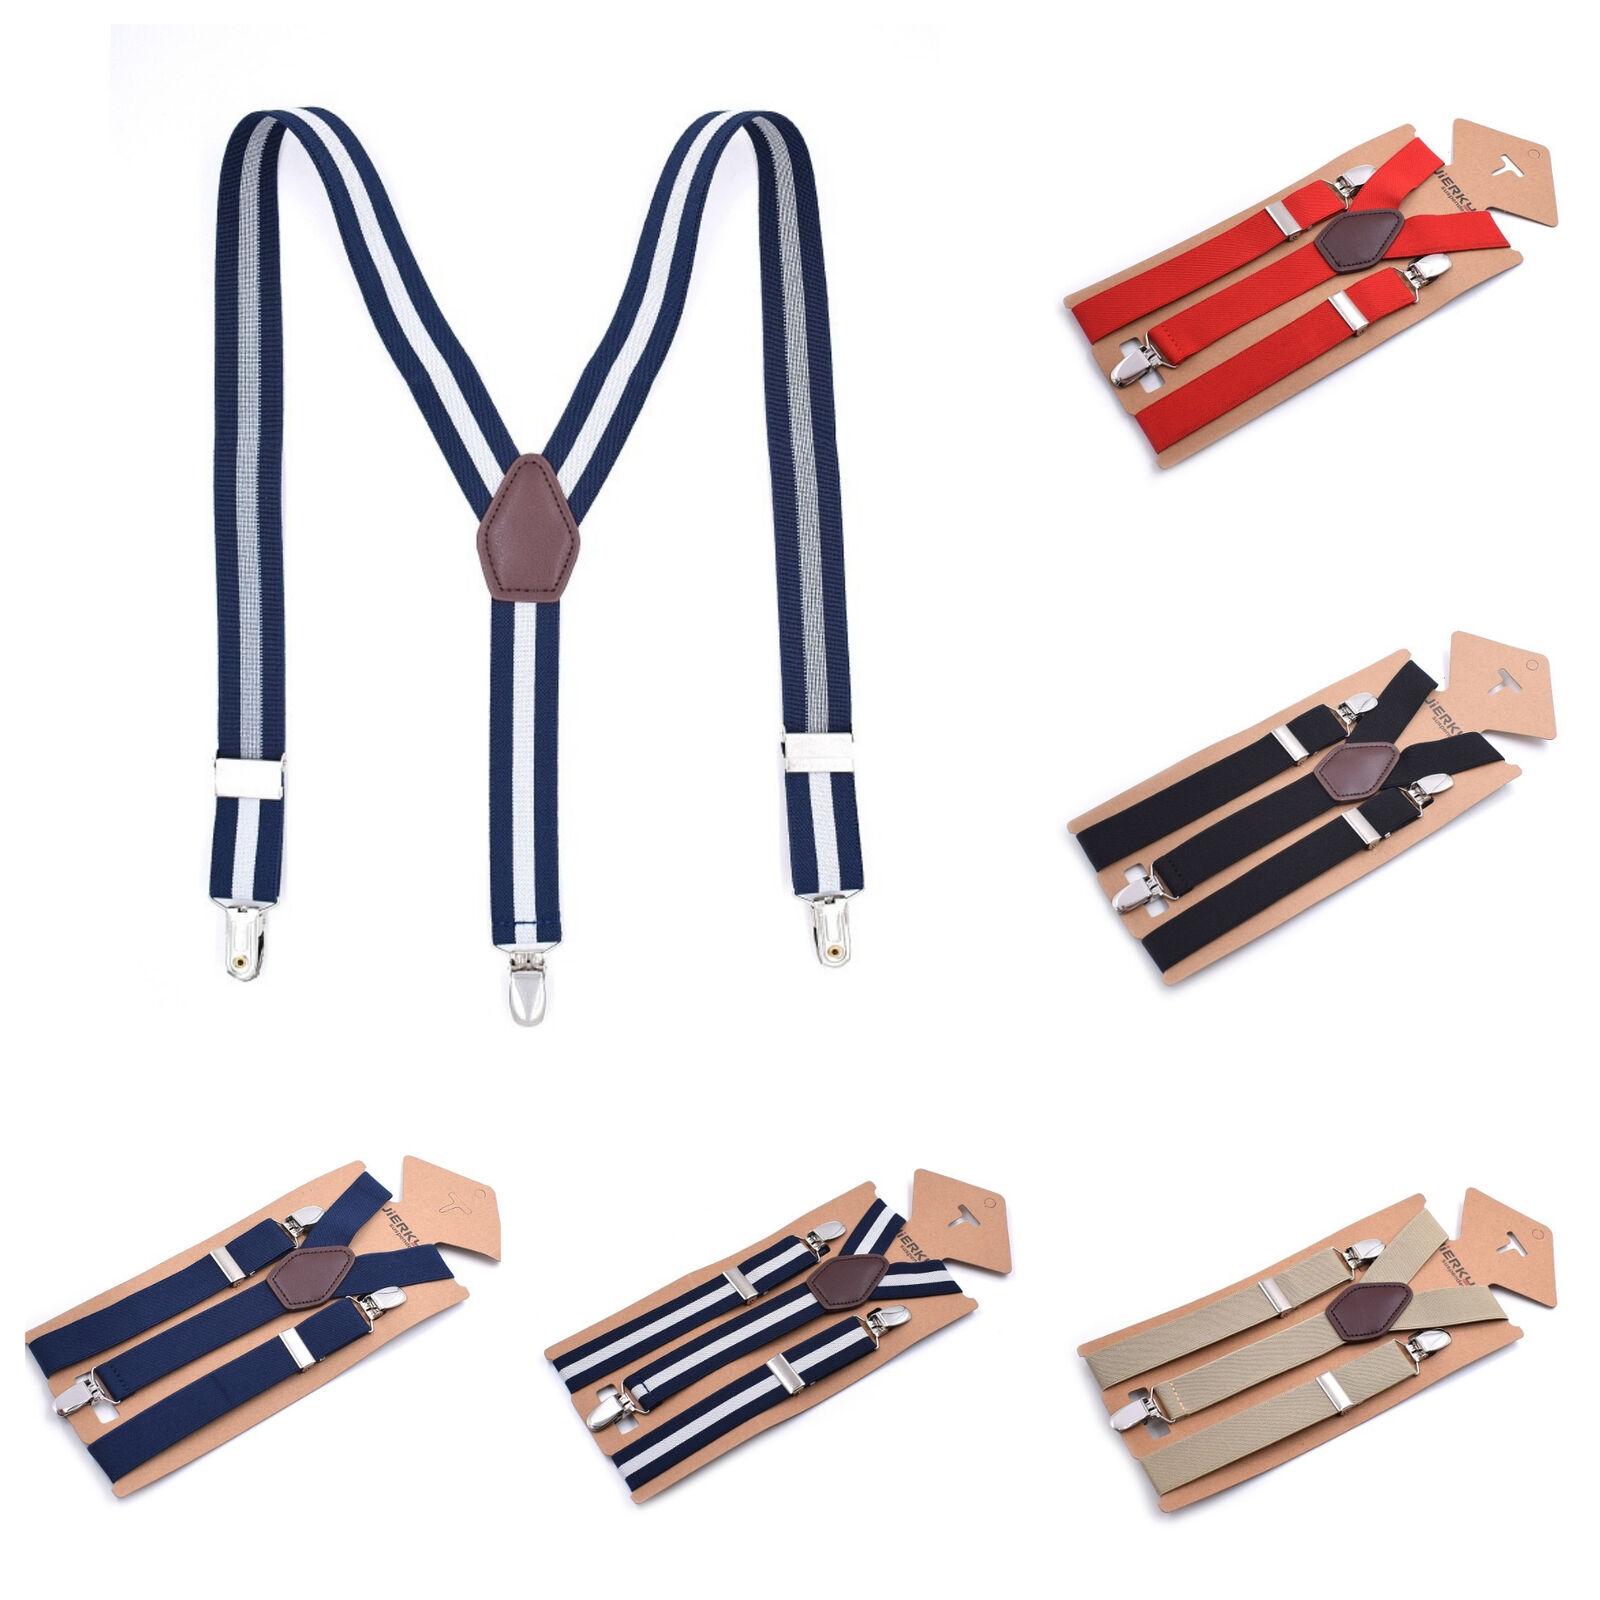 Mens 25mm Adjustable Braces Heavy Duty Clip On Trouser Braces Elastic Suspenders